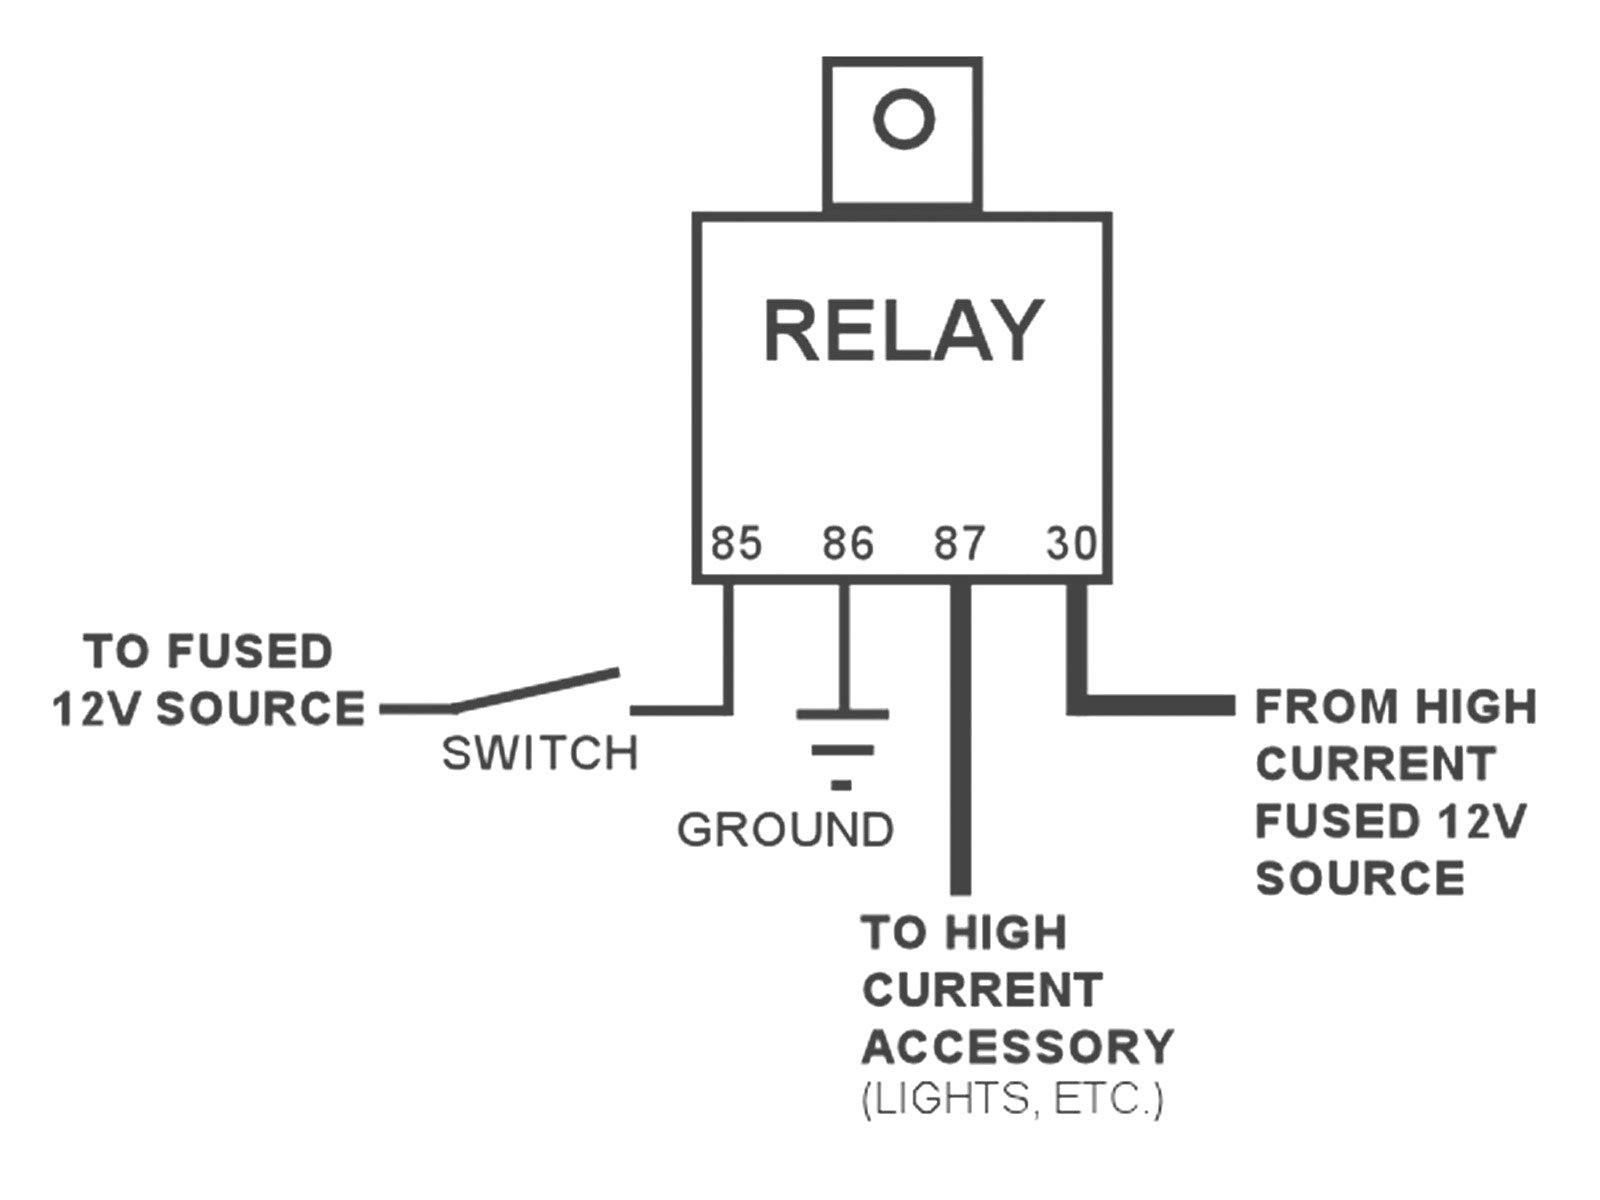 4 Pin Relay Wiring Diagram Luxury Diagram Pinelay Wiring Diagrams Automotive Beauteous Idec Del sol